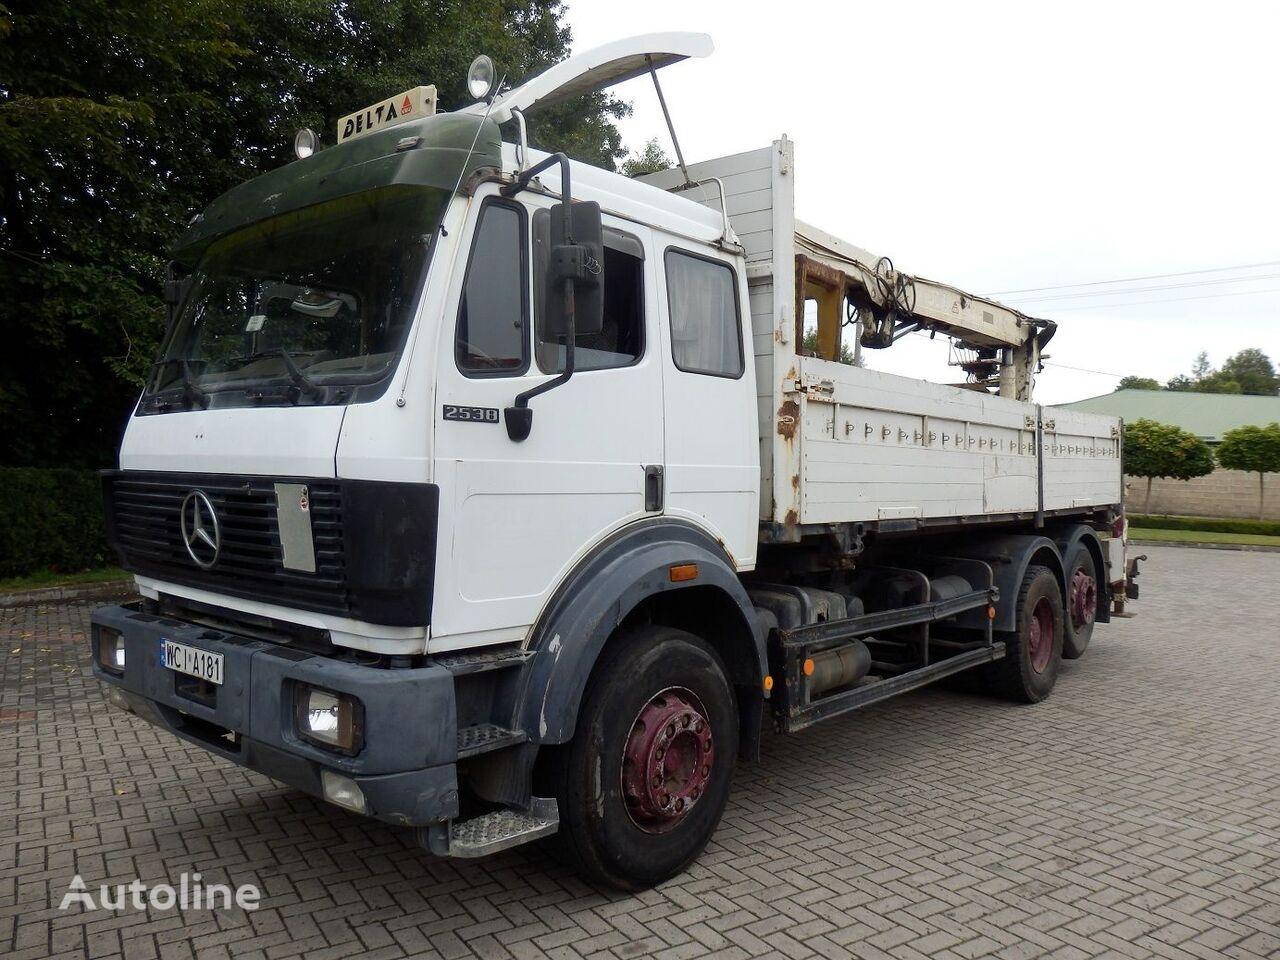 ciężarówka burtowa MERCEDES-BENZ SK 2538 6x2 Engine V8 13.t Axles